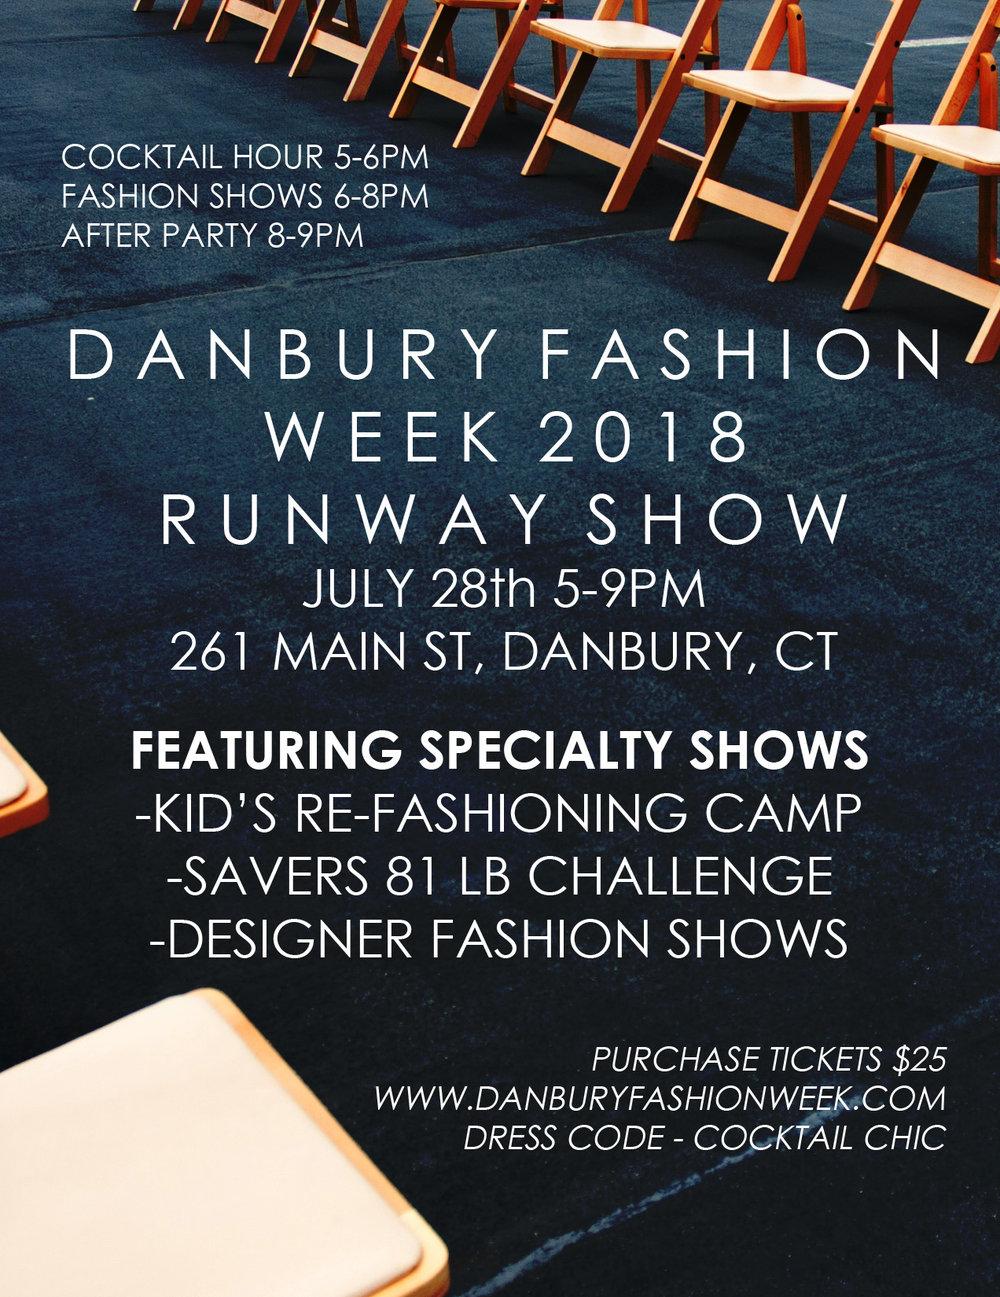 Saturday July 28th 5-9pm @261 Main St, Danbury, CT